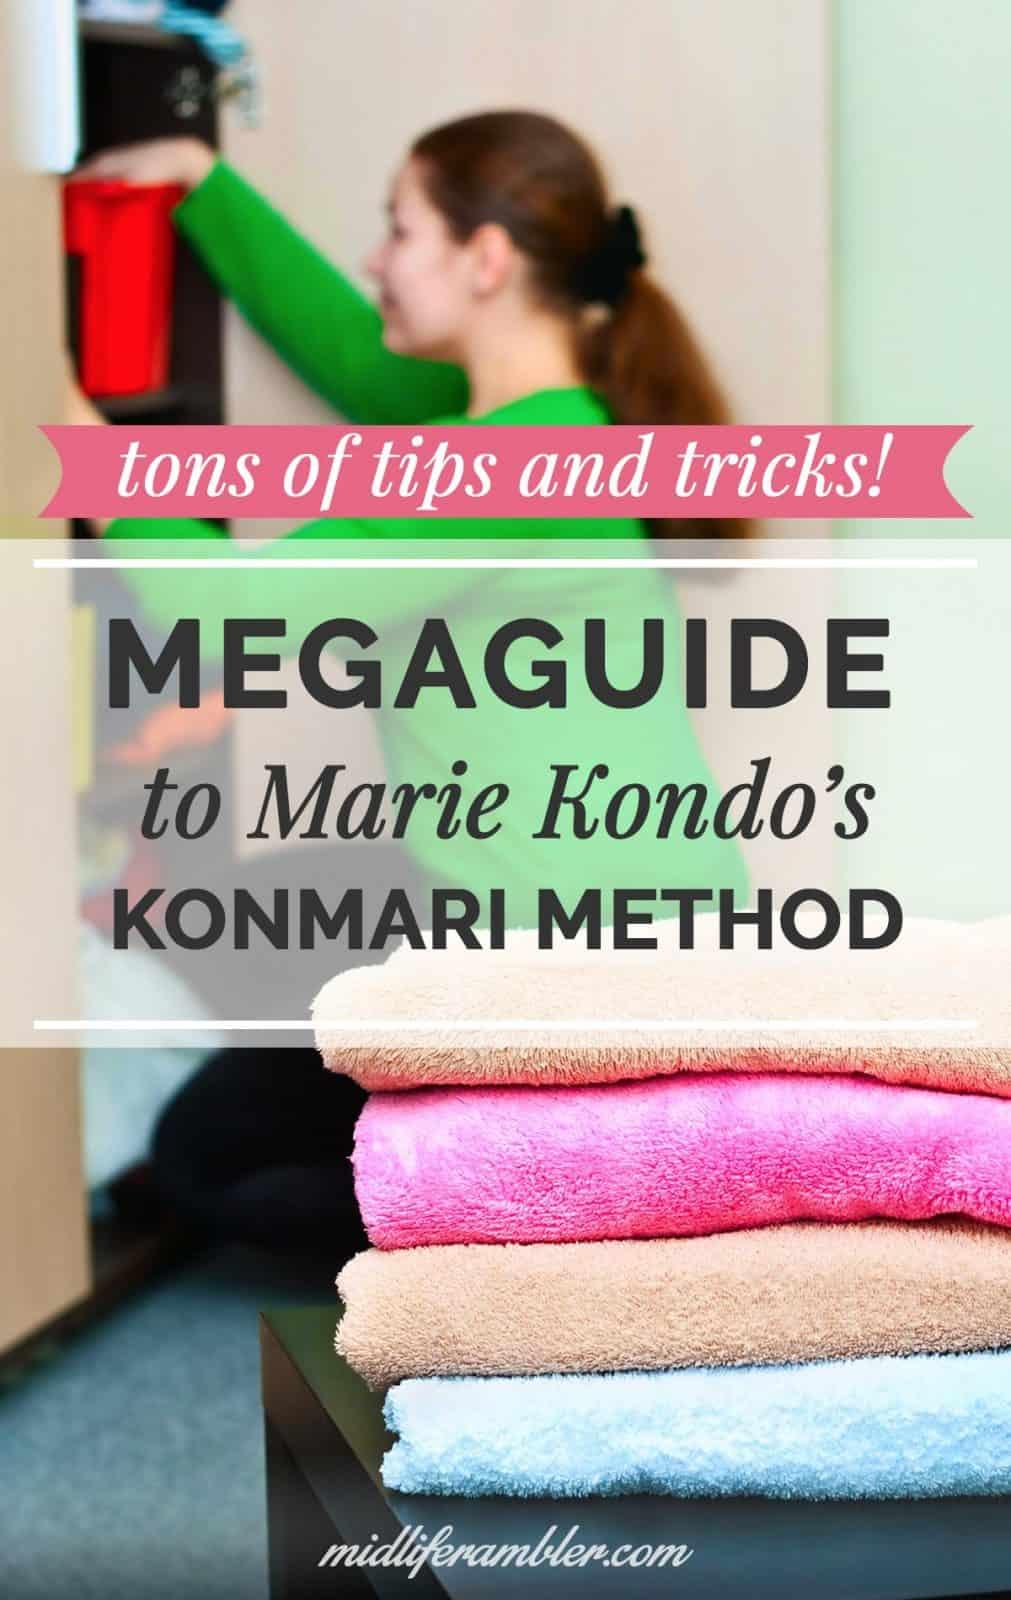 A Megaguide to Marie Kondo's KonMari Process 13